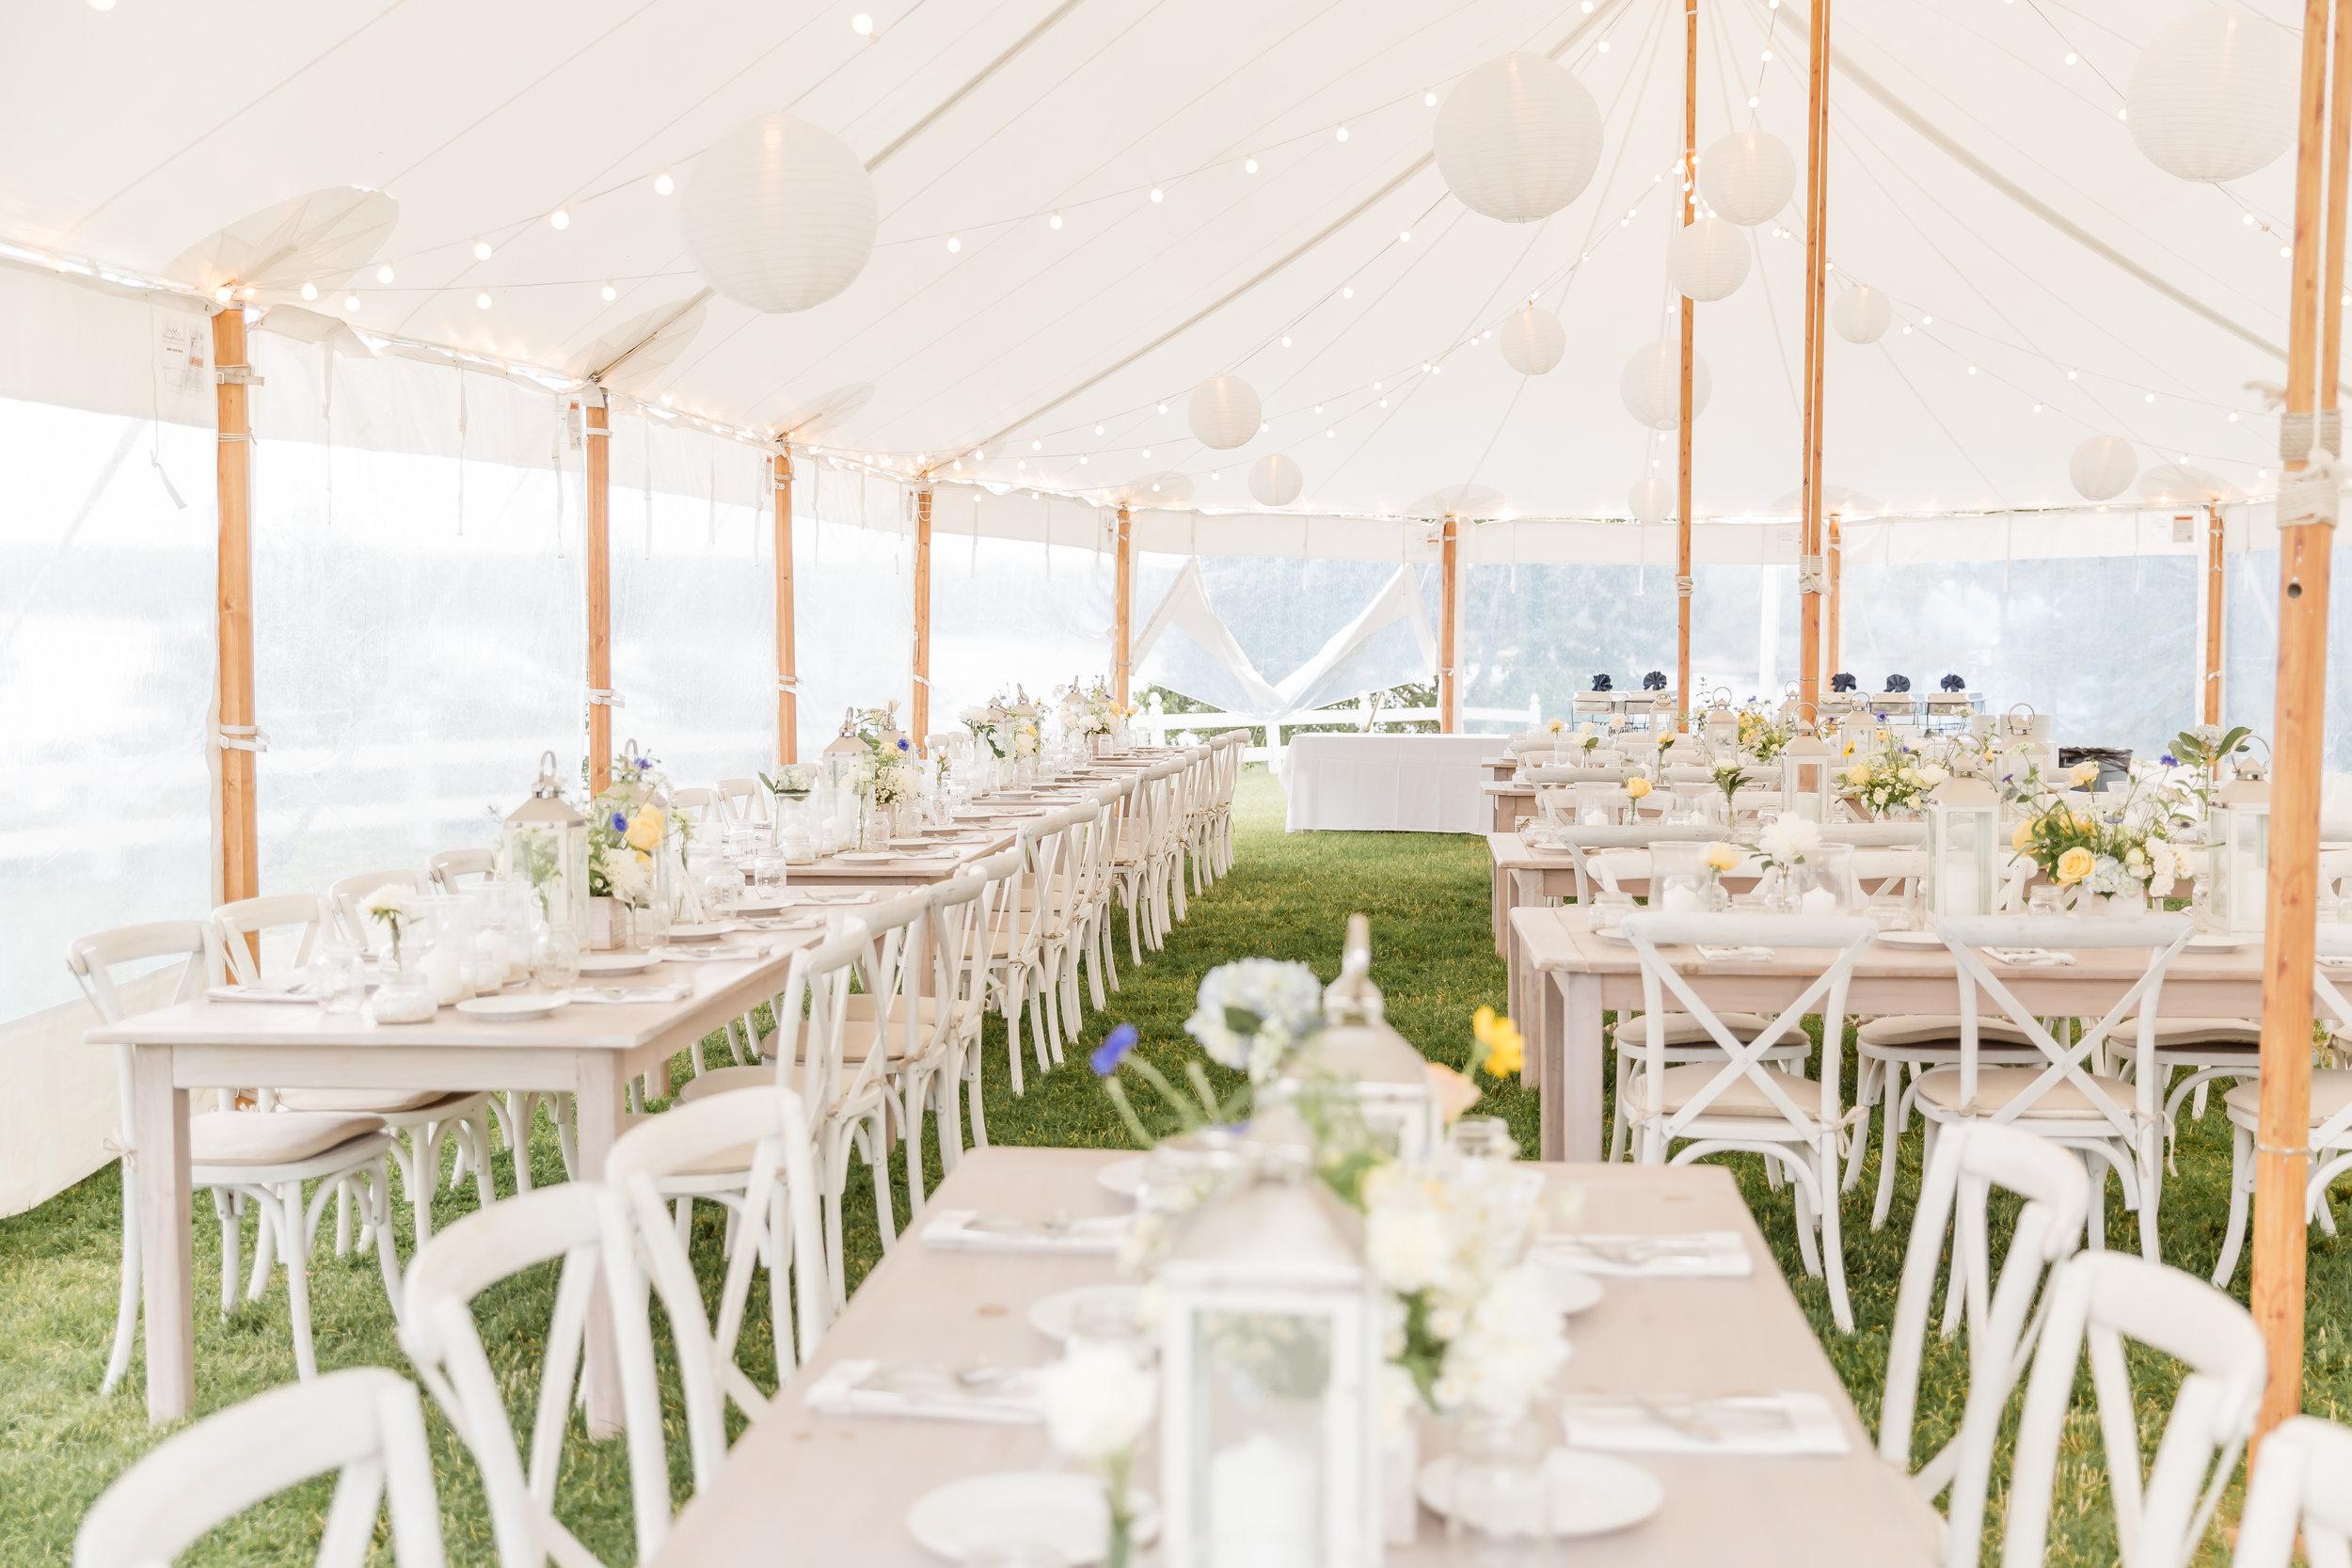 Luxury-Rehearsal-Dinner-Winslow-Estate-Cape-Cod-MA-Daylynn-Designs-58.jpg